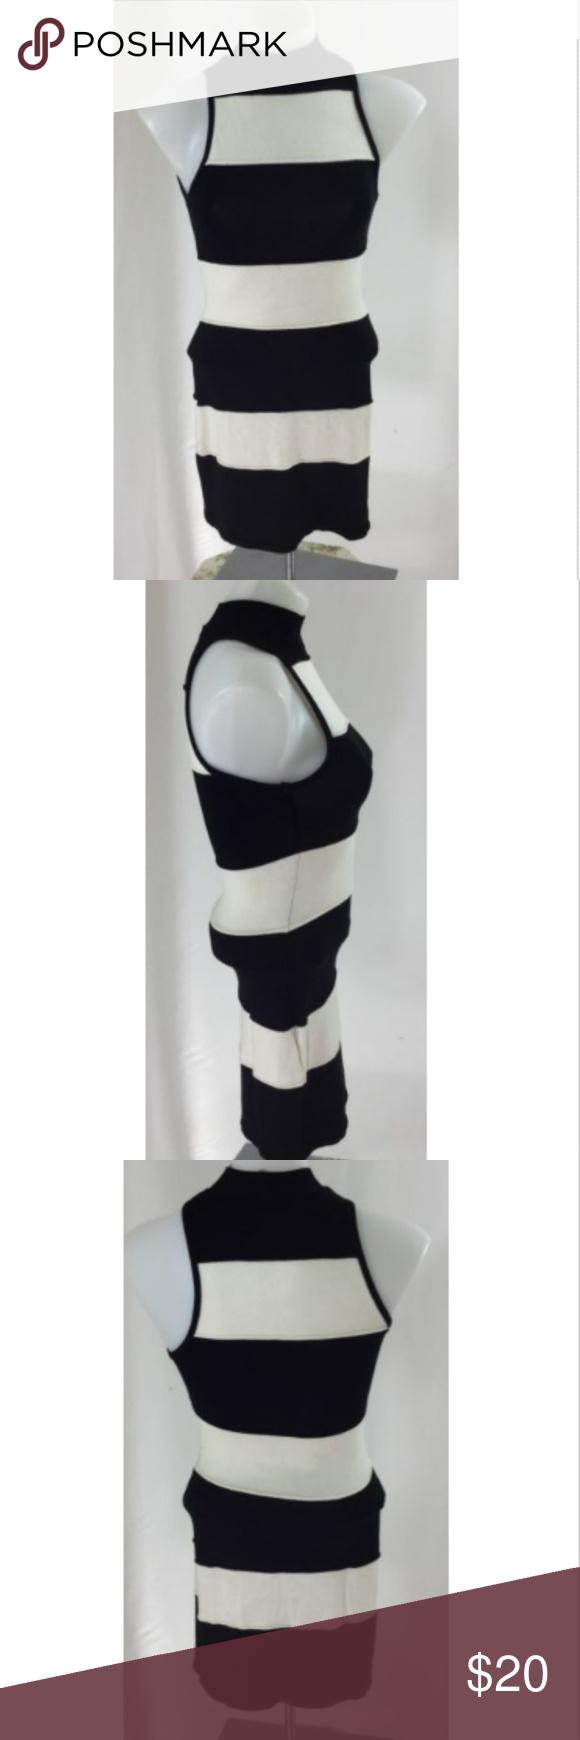 042b6f88c50 Nasty Gal Stripe Sweater Dress Sz Small Nasty Gal Dress Mock Turtleneck  Sweater Sz S Black